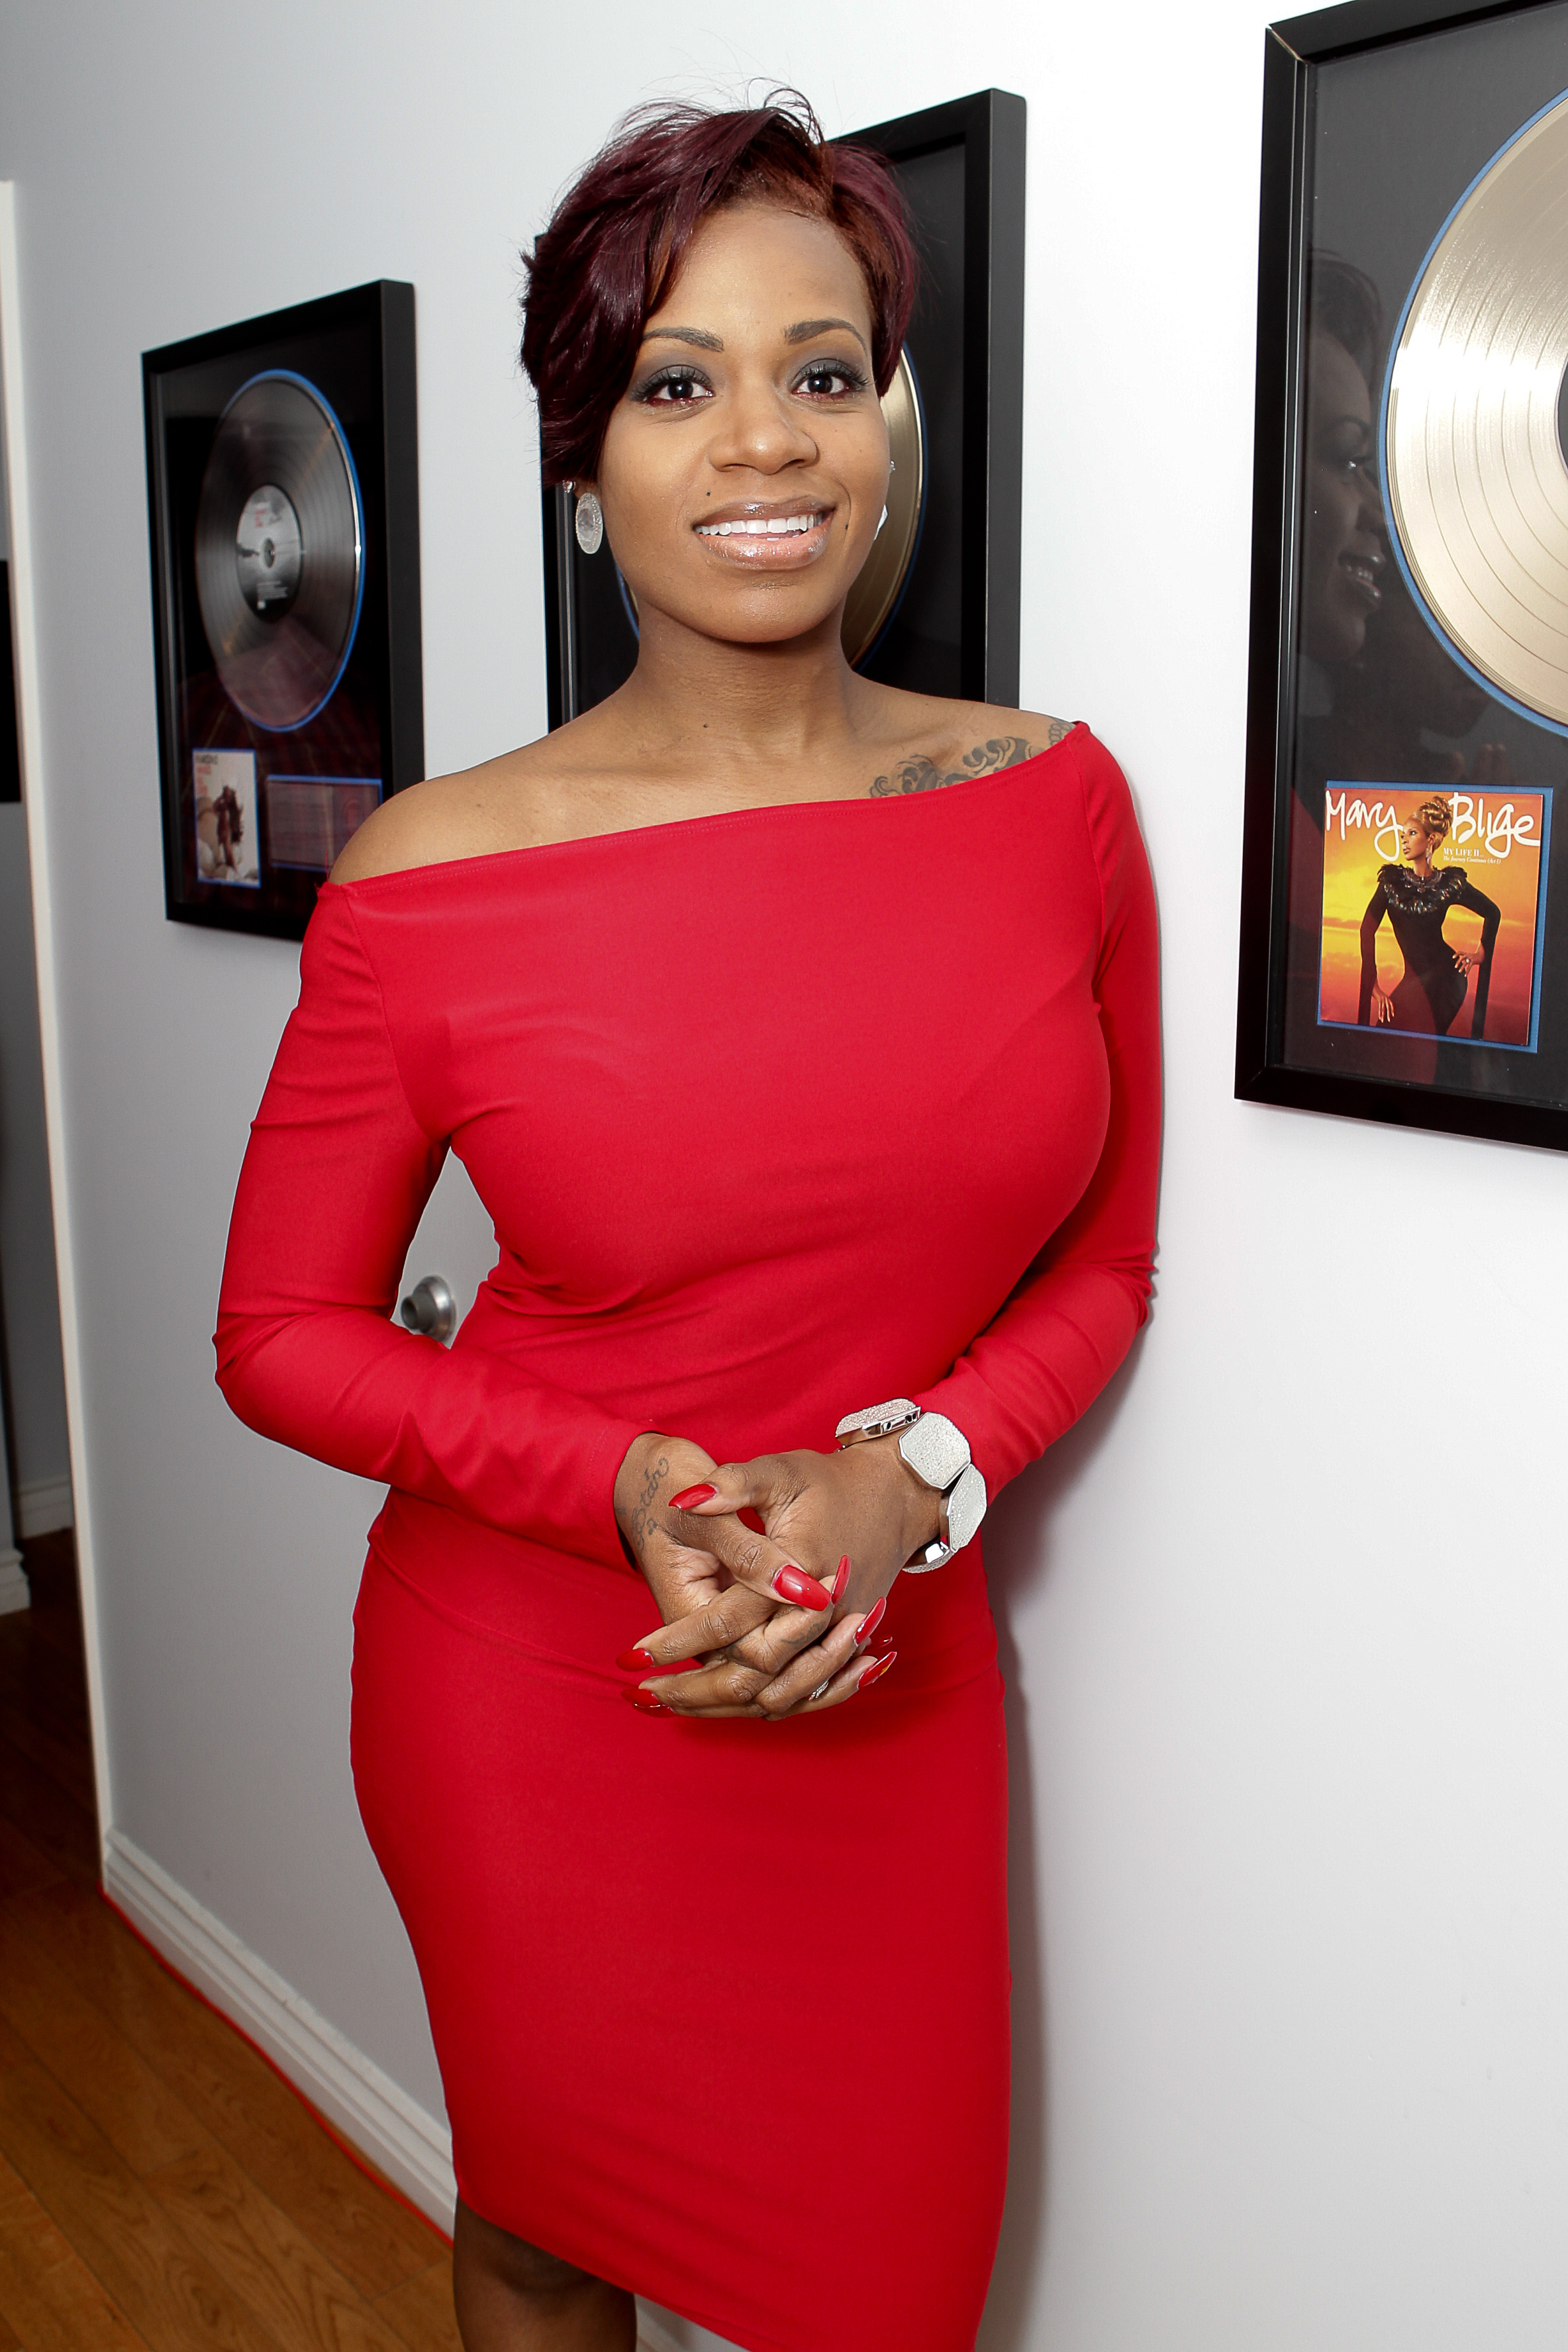 Fantasia Barrino: Bio, Height, Weight, Measurements